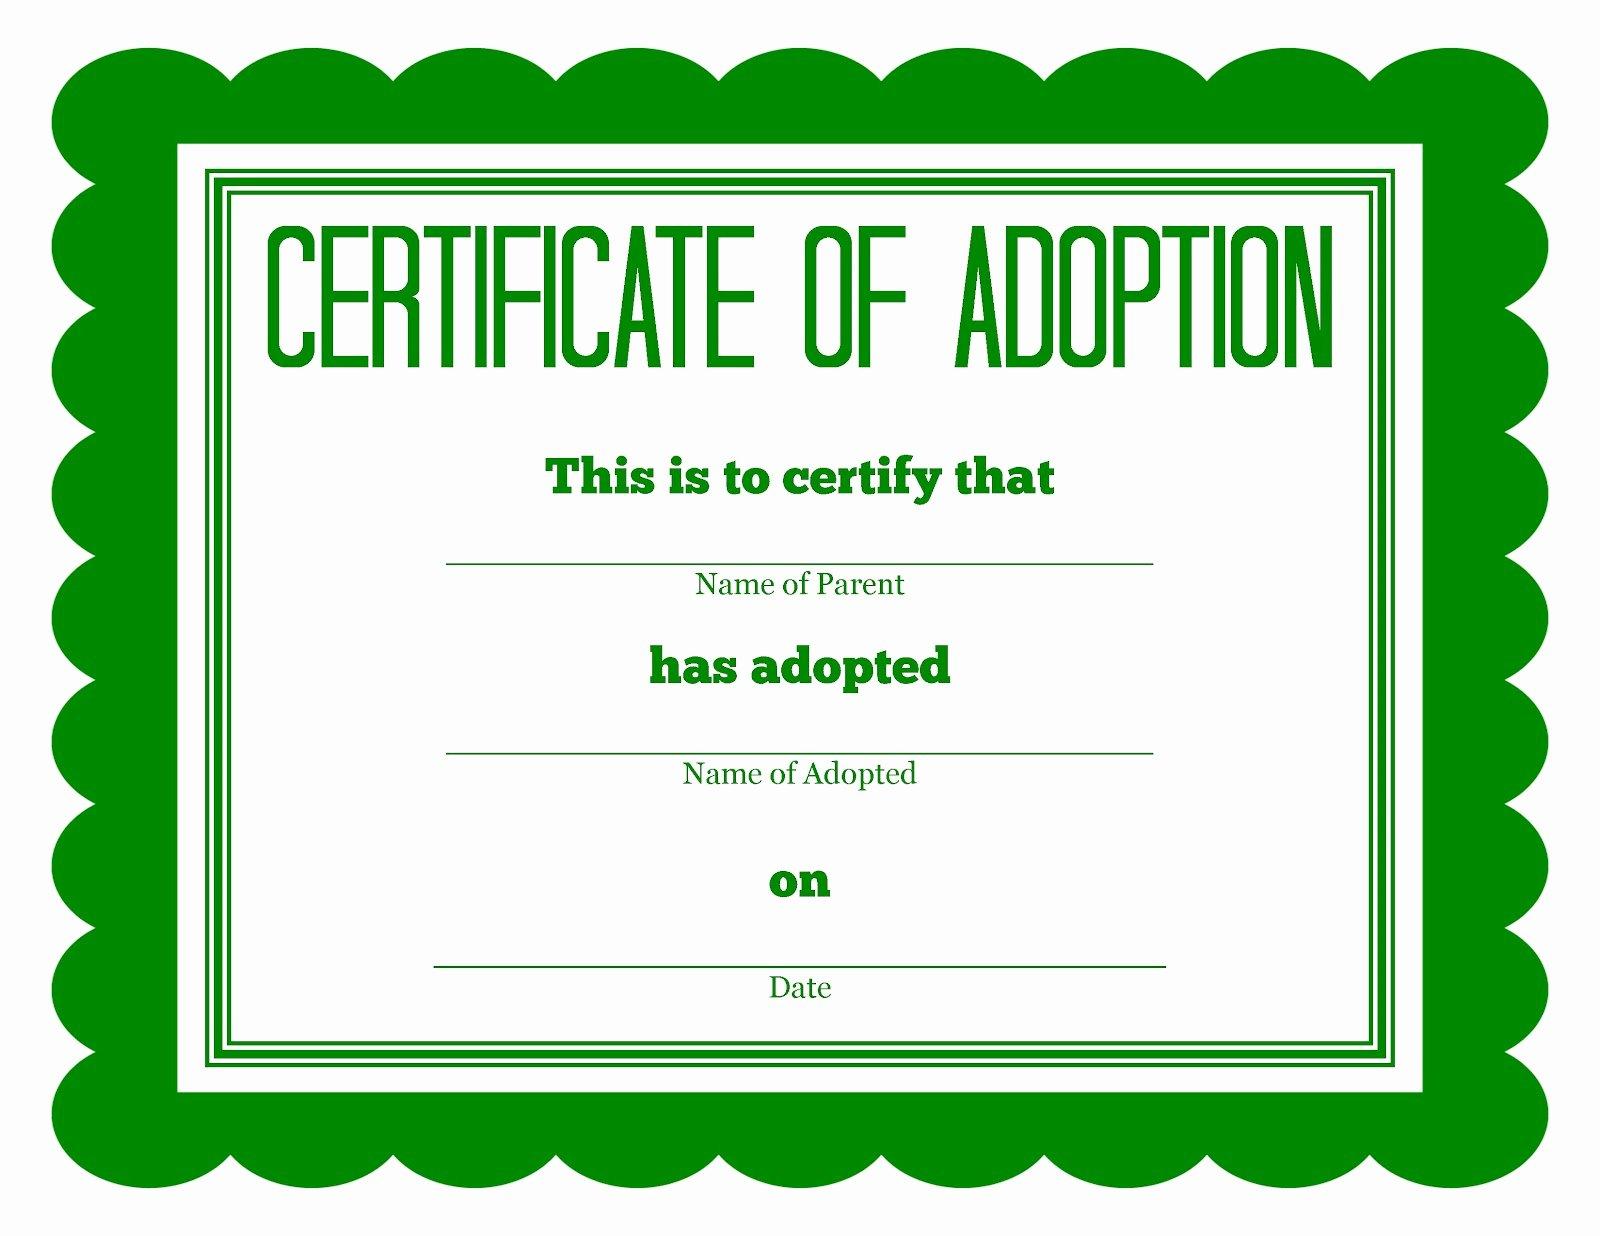 Stuffed Animal Adoption Certificate Template Best Of More Stuffed Animal Adoption Certificates